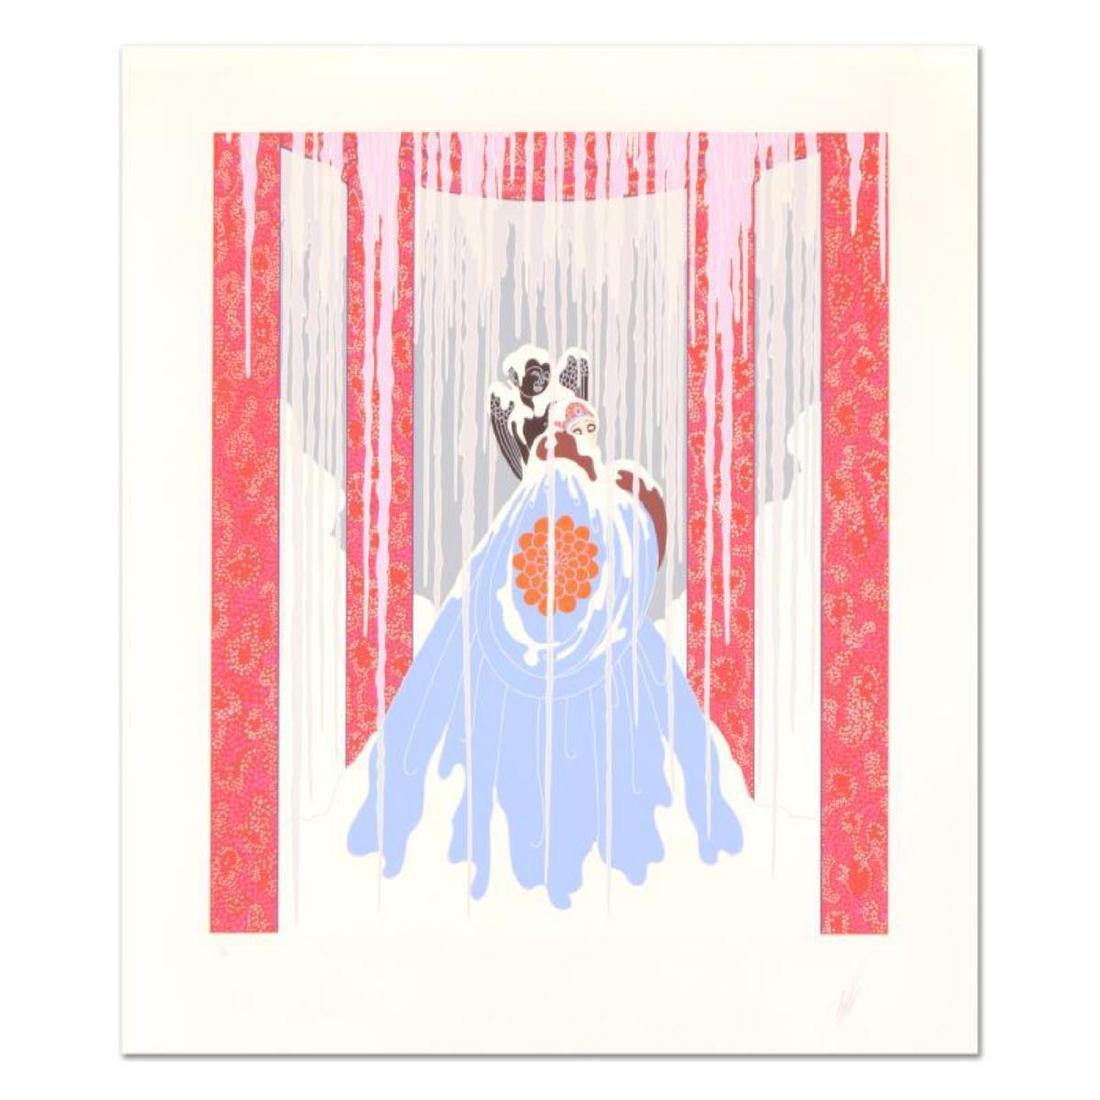 "Erte (1892-1990), ""Loves Captive"" Limited Edition"